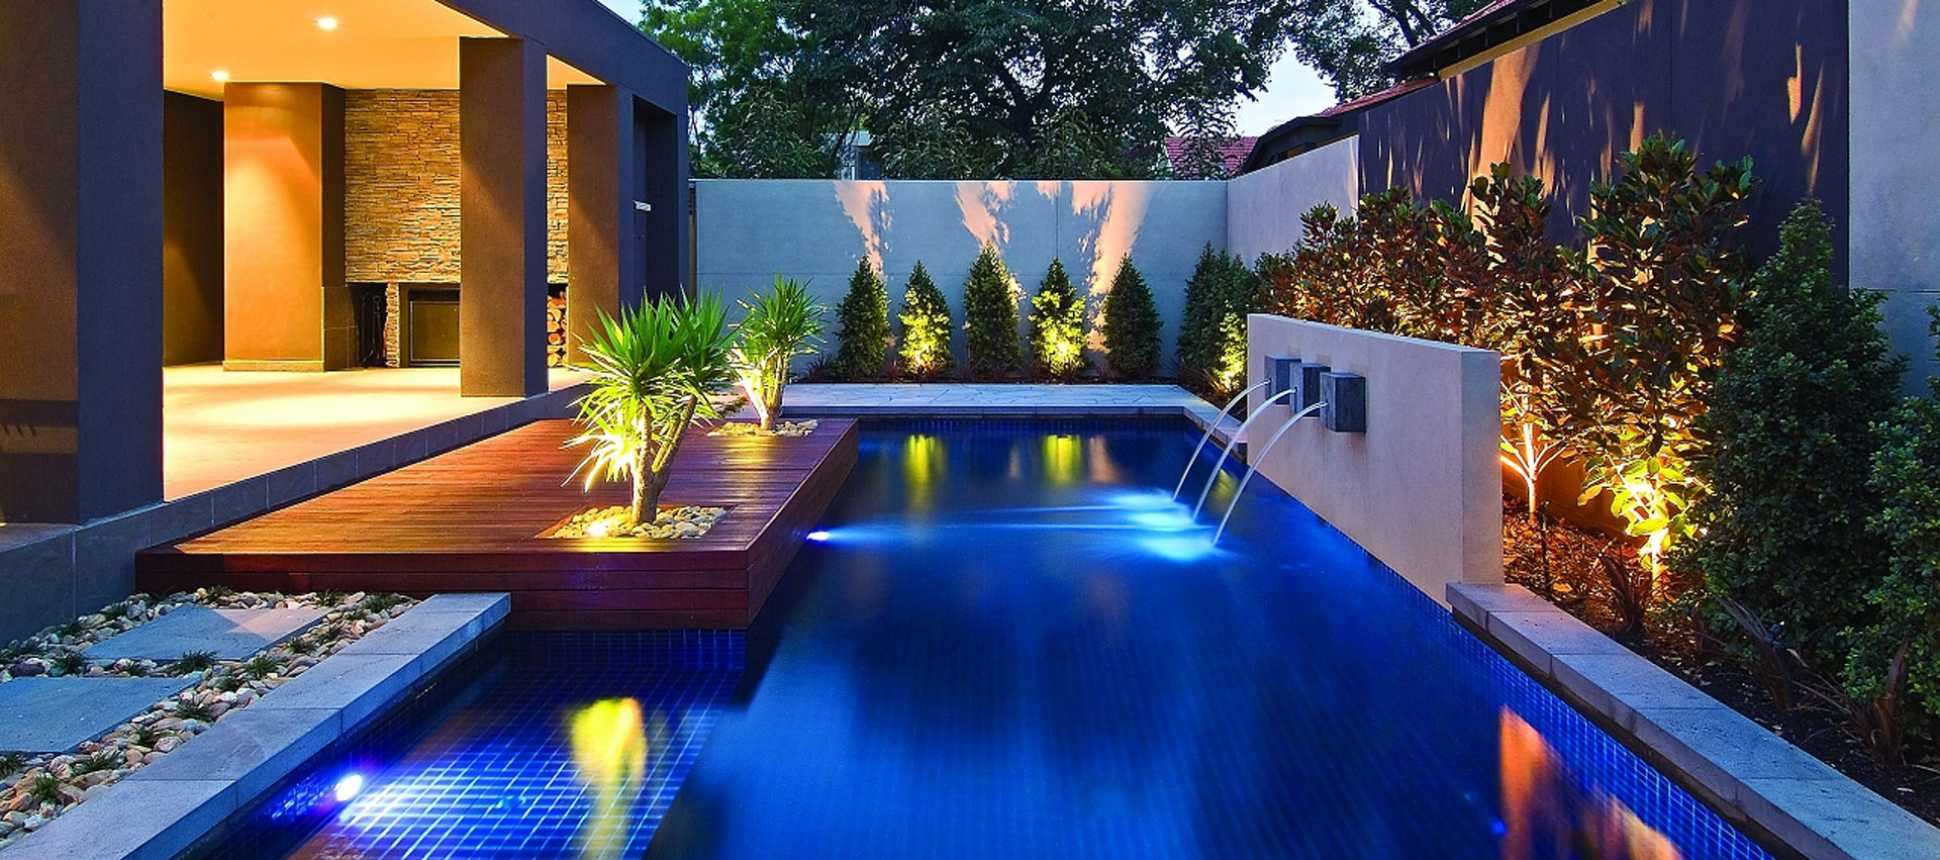 Pool Beleuchtung Swimming Pool Licht Schwimmbad Leuchten